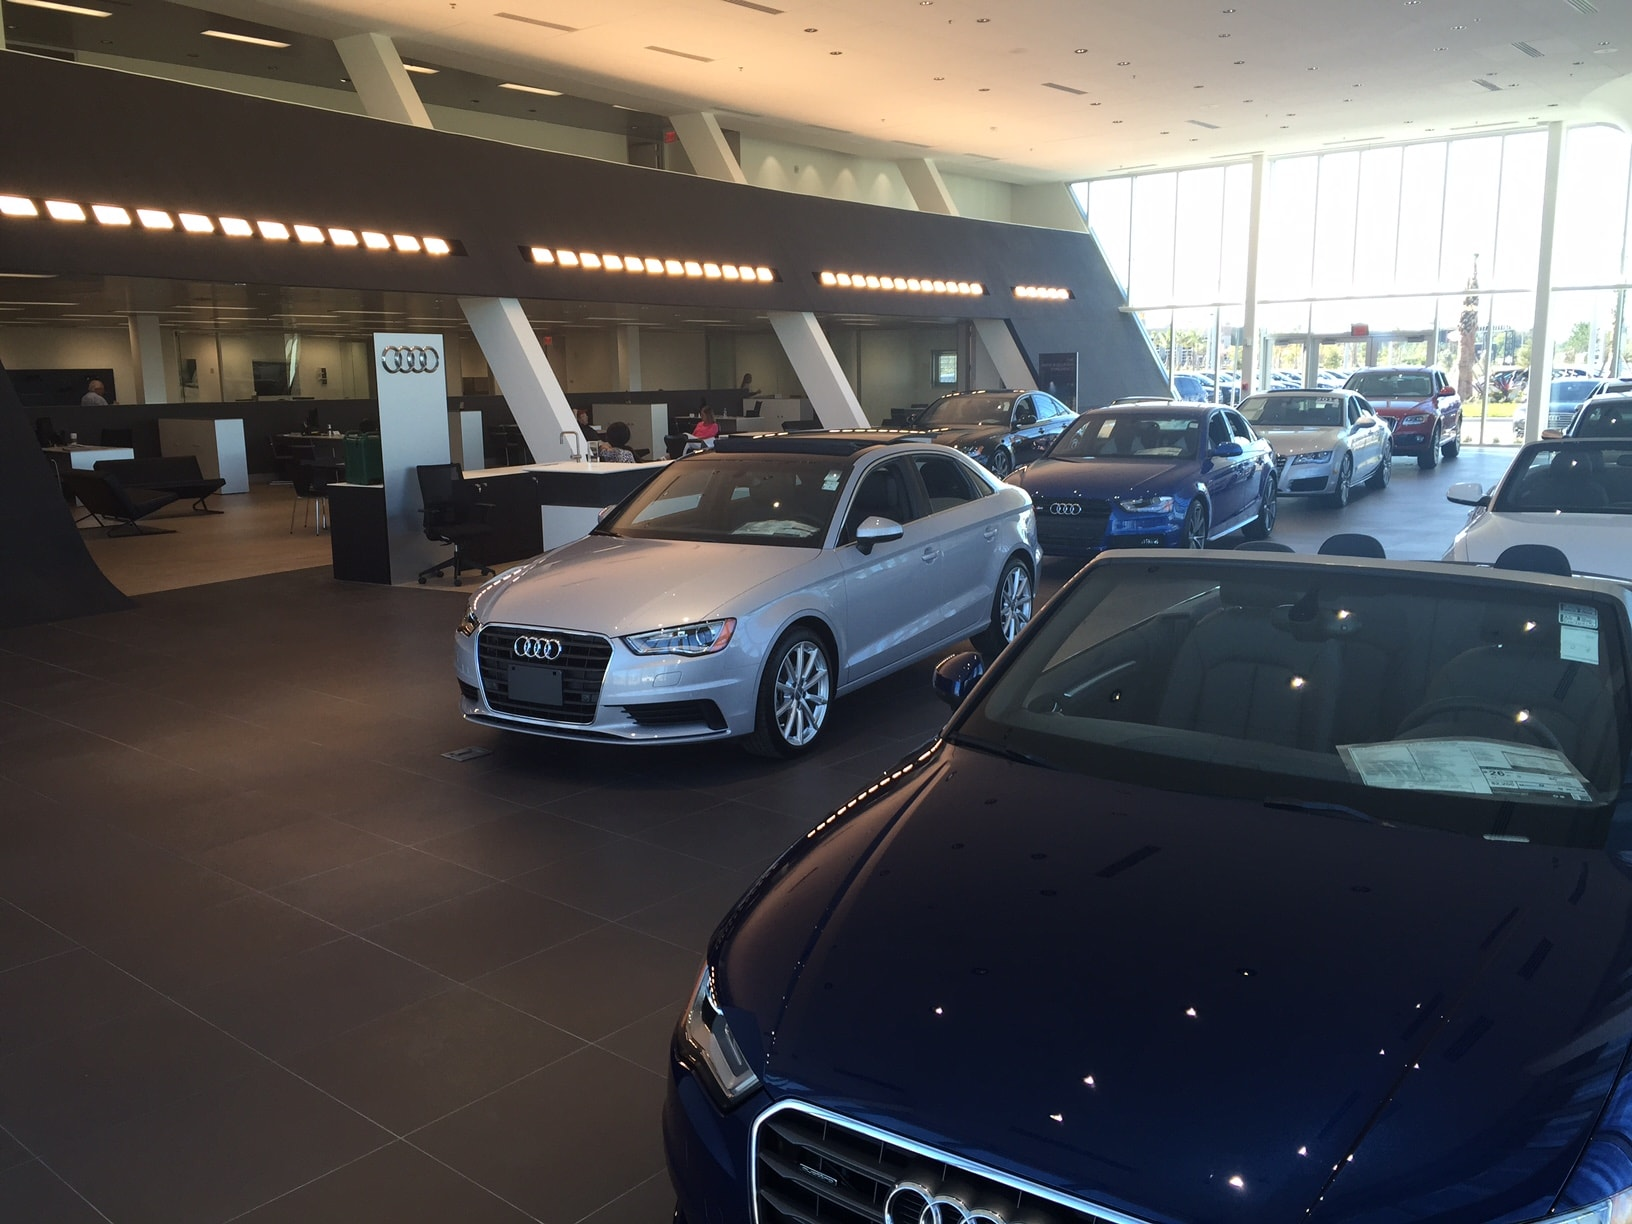 Audi Ft Myers >> About Audi Fort Myers Full Service Audi Dealer| Ft. Myers, Naples and Sarasota Southwest Florida